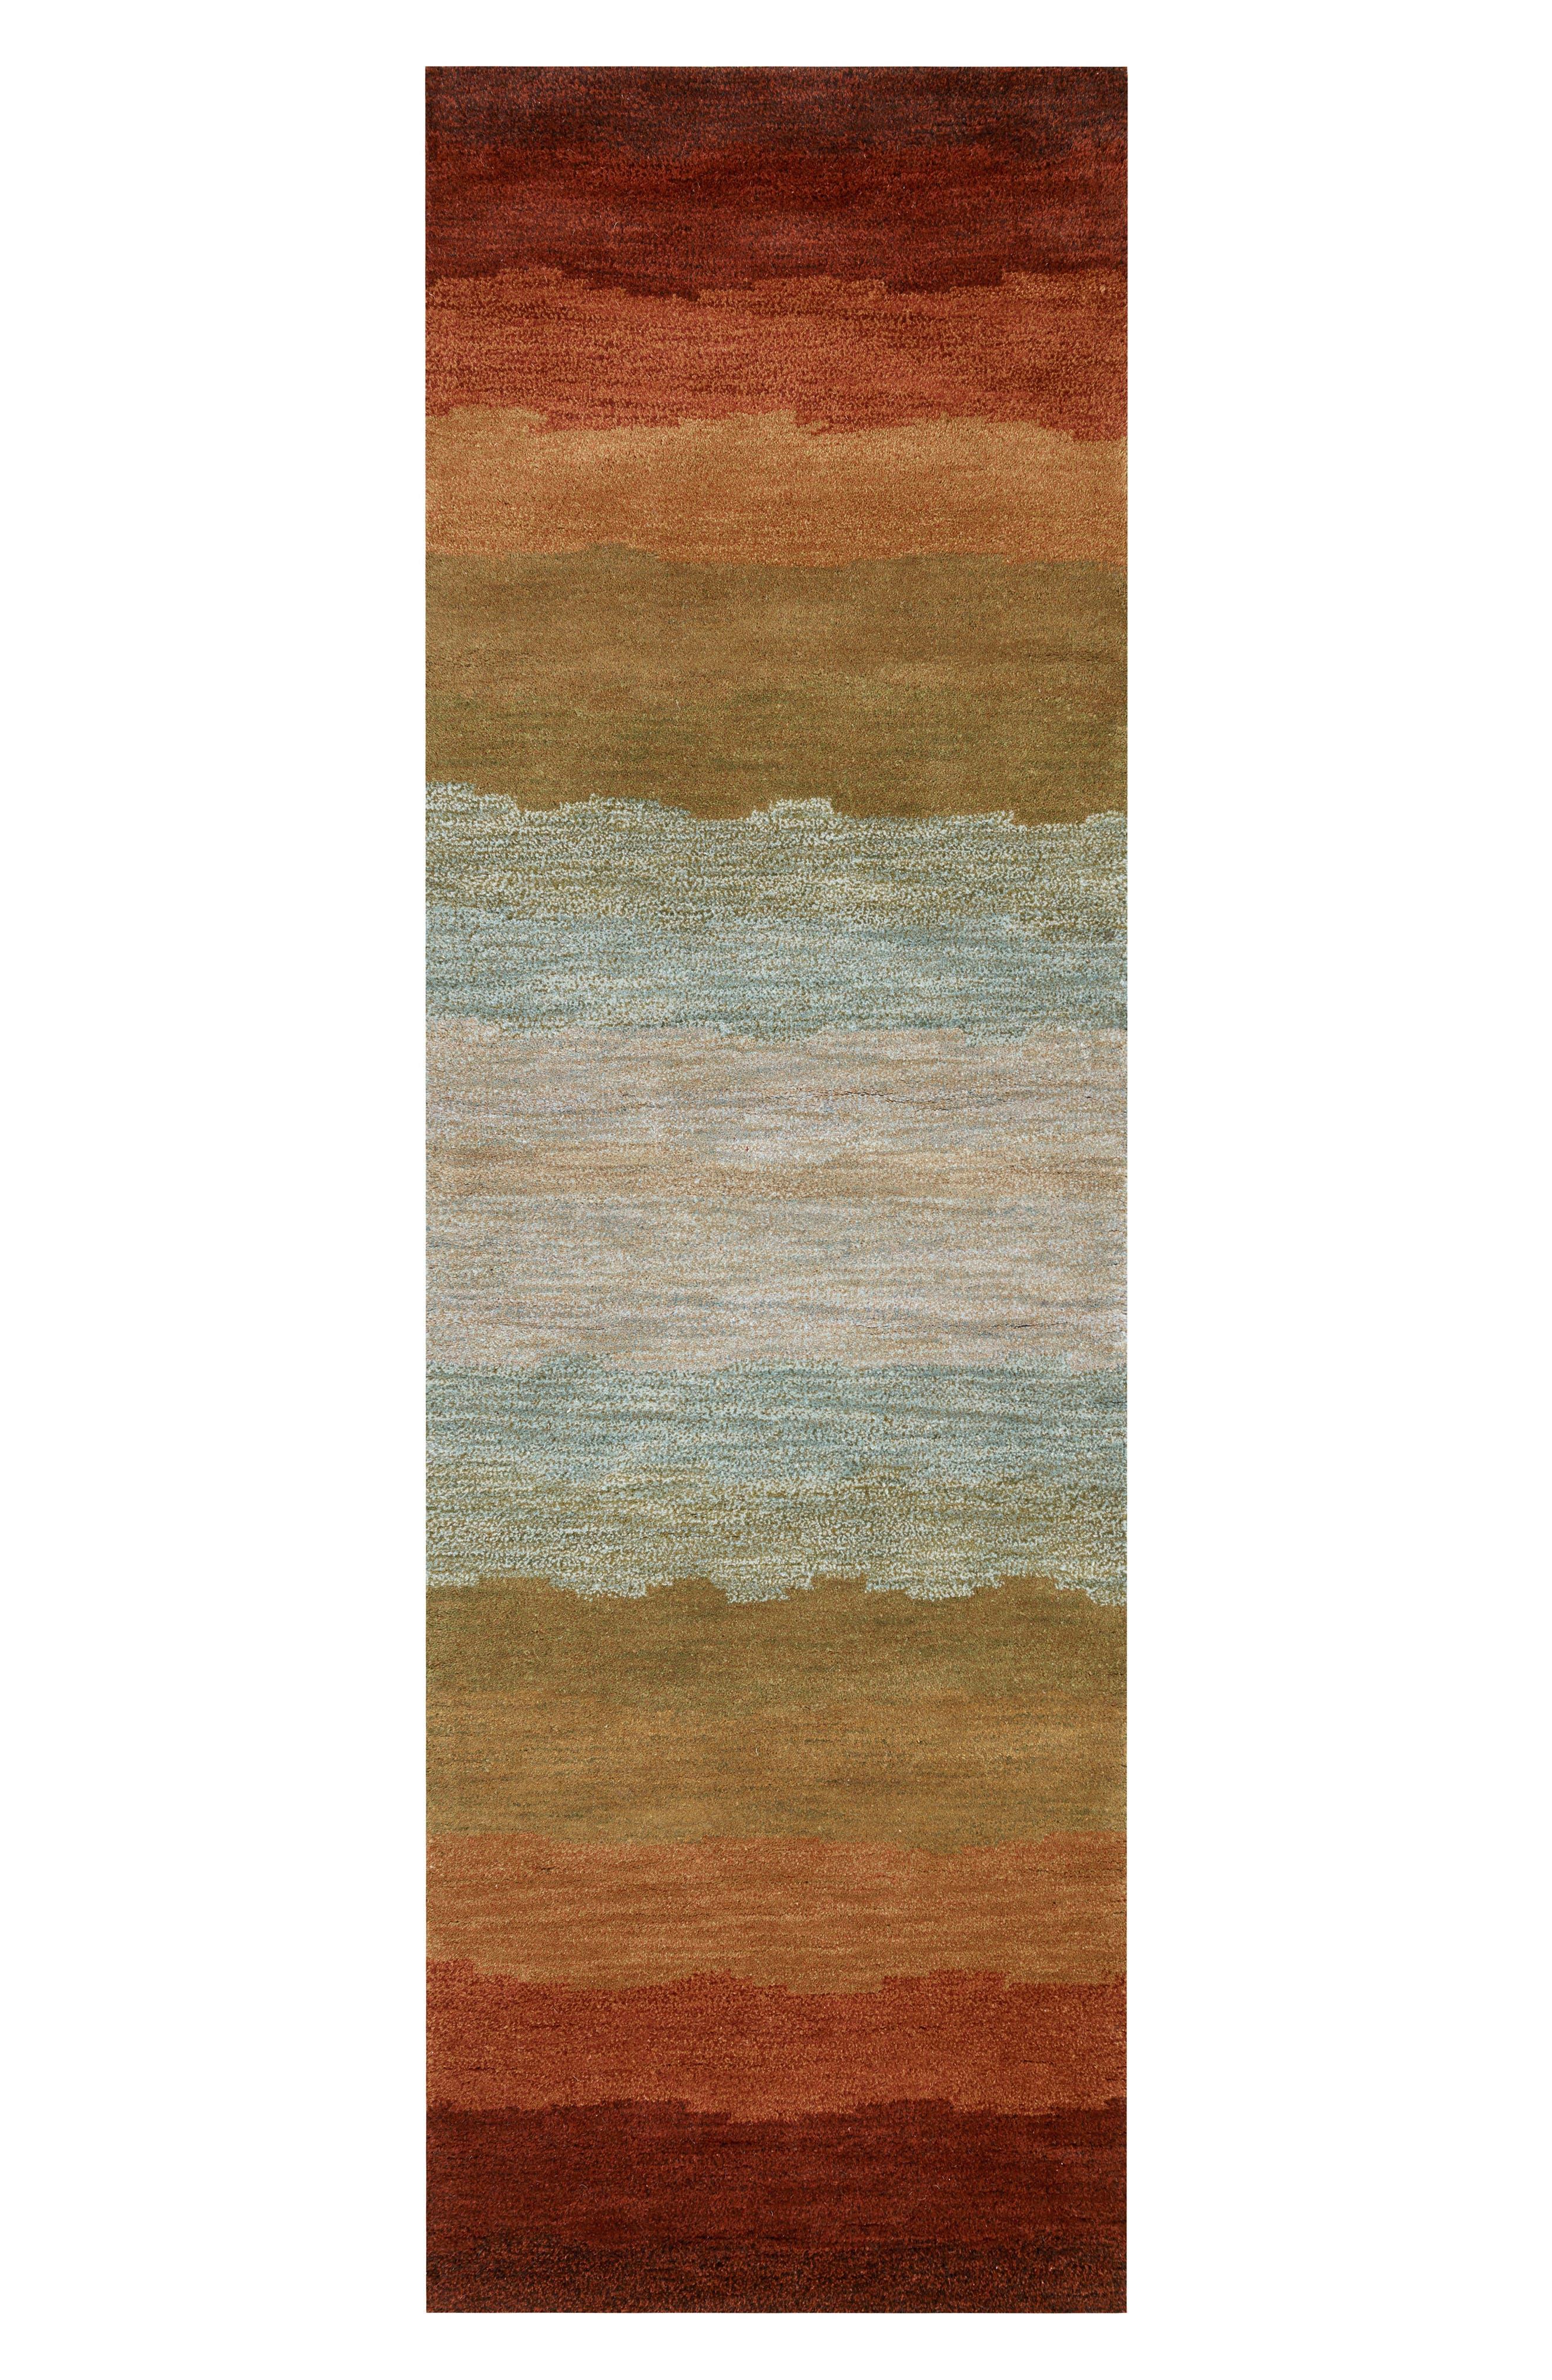 Desert Oasis Hand Tufted Wool Area Rug,                             Alternate thumbnail 6, color,                             220